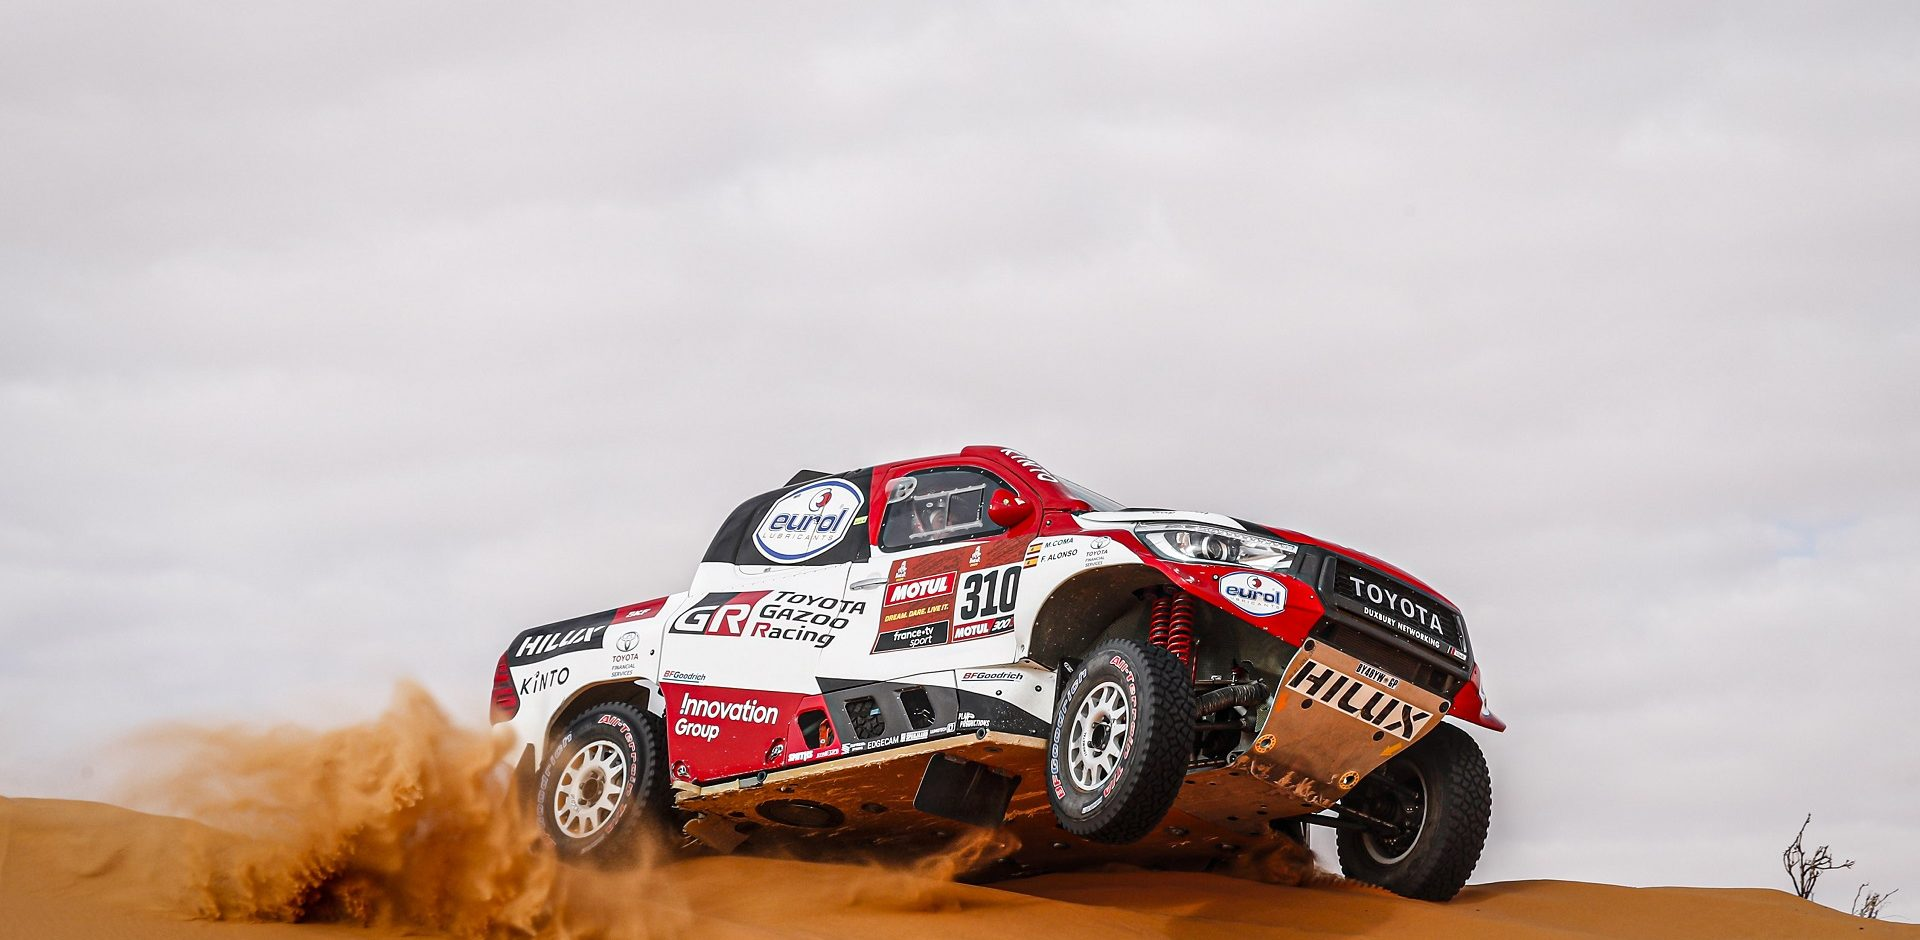 310 Alonso Fernando (esp), Coma Marc (esp), Toyota Hilux, Toyota Gazoo Ragin, Auto, Car, action during Stage 6 of the Dakar 2020 between Ha'il and Riyadh, 830 km - SS 478 km, in Saudi Arabia, on January 10, 2020 - Photo DPPI